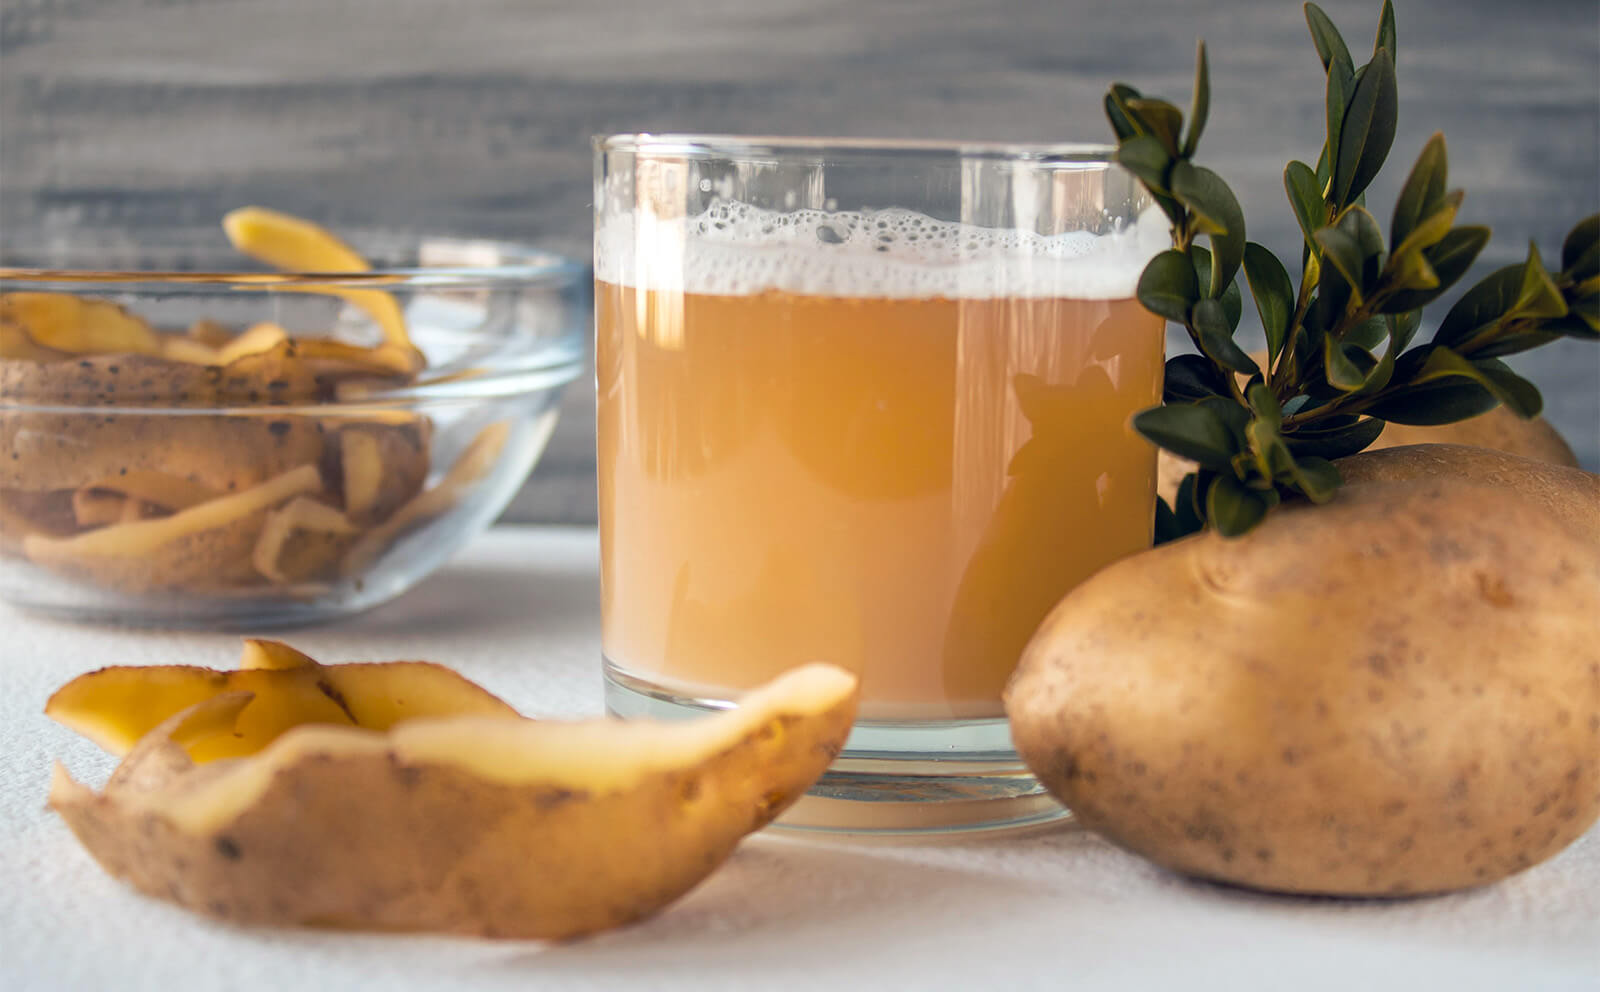 Чем полезен сок сырой картошки